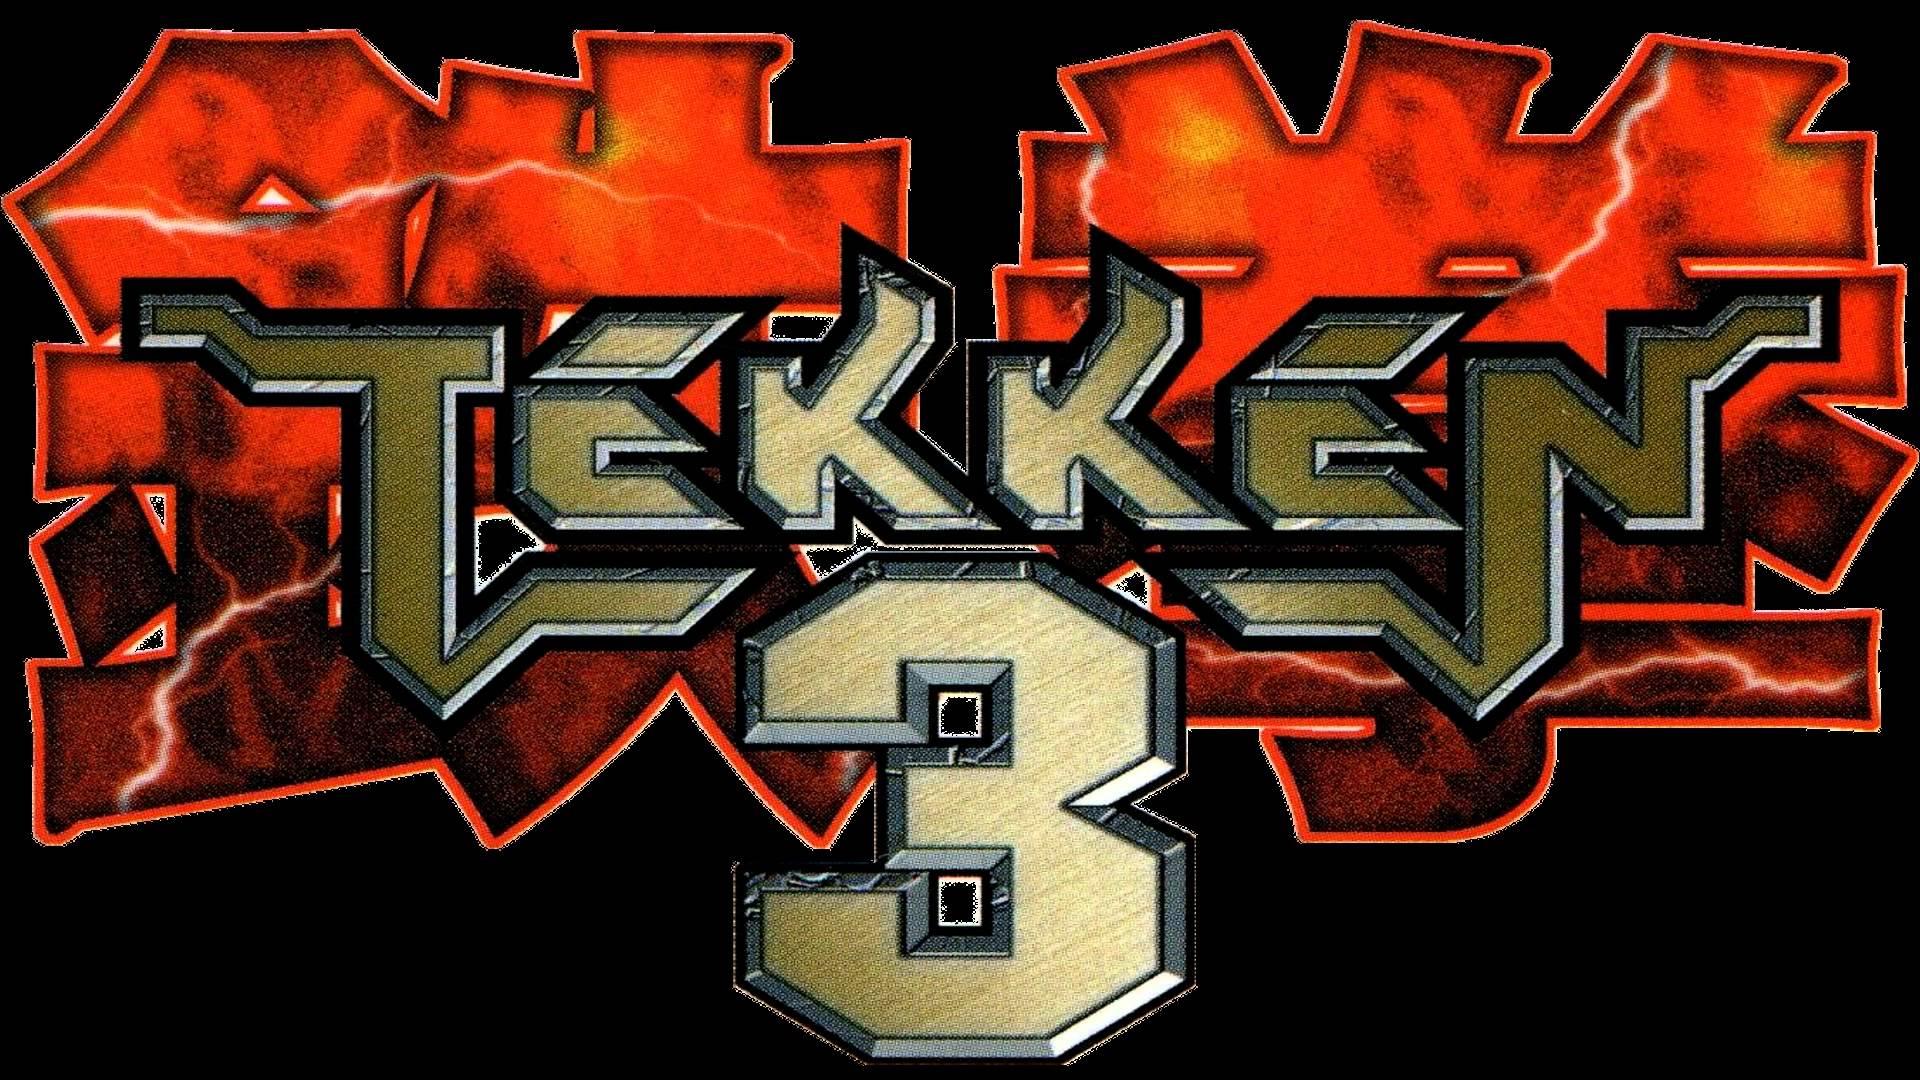 Tomb Raider 2013 Wallpaper Hd Tekken 3 Pc Game Free Download Direct Link